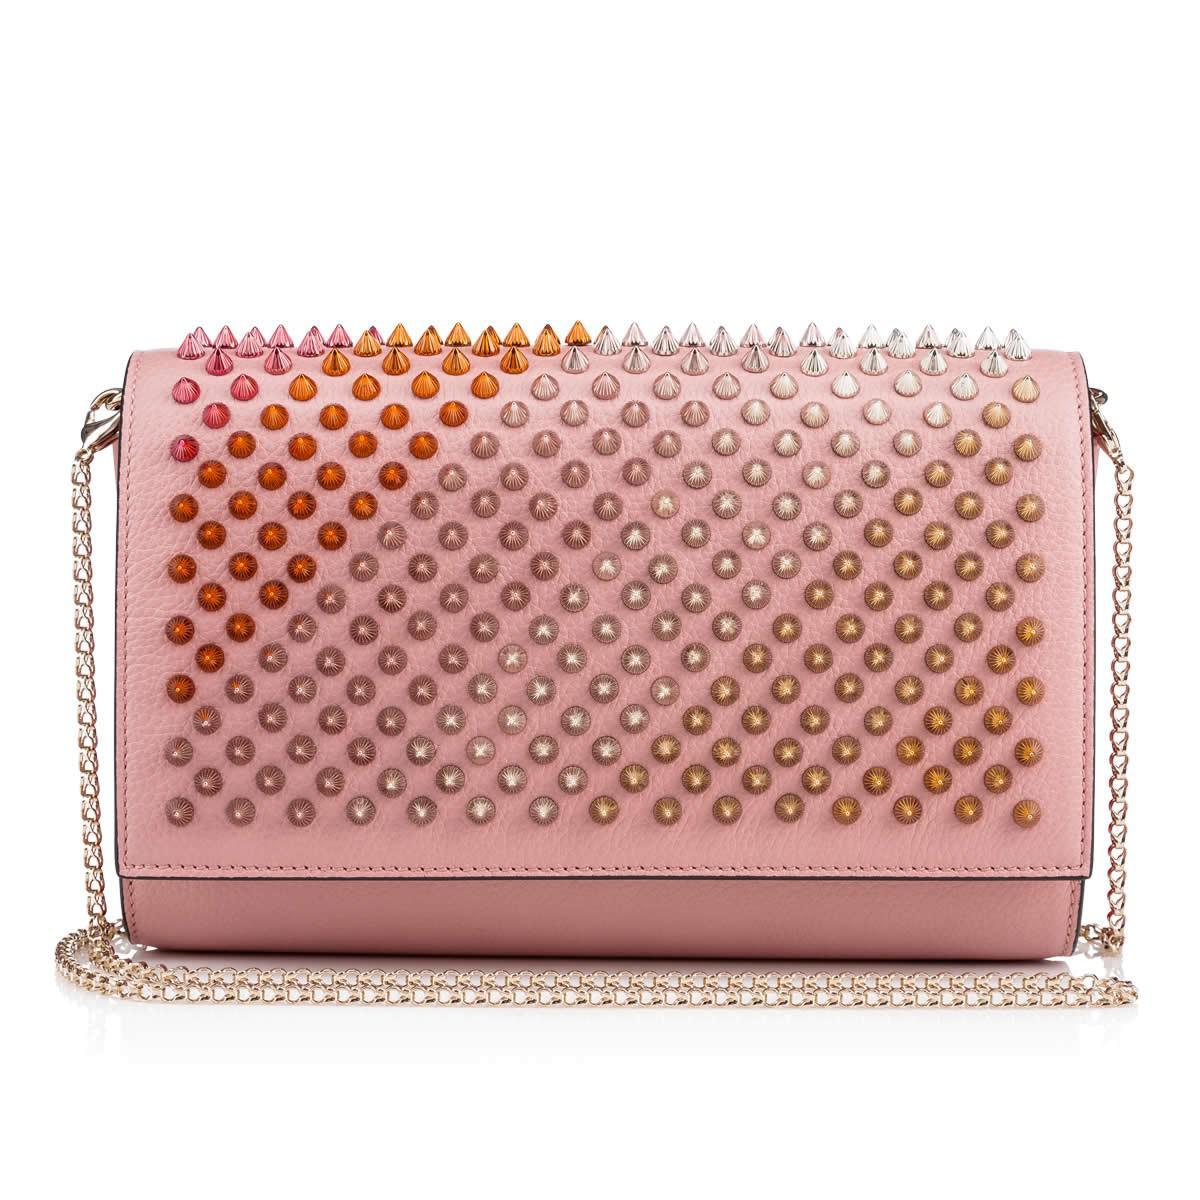 Christian Louboutin. Women's Pink Paloma Clutch